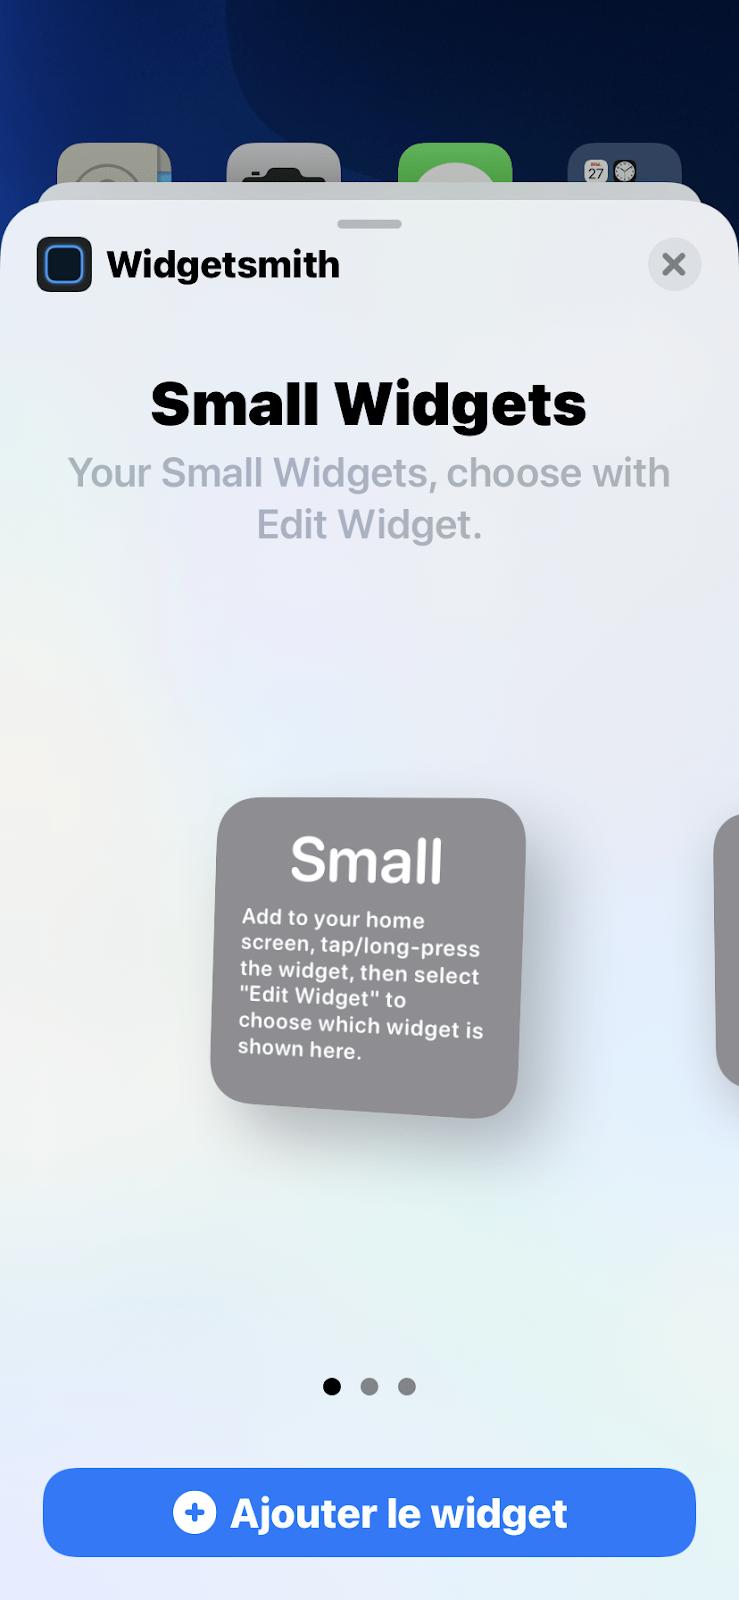 WidgetSmith - tuto comment utiliser l'application